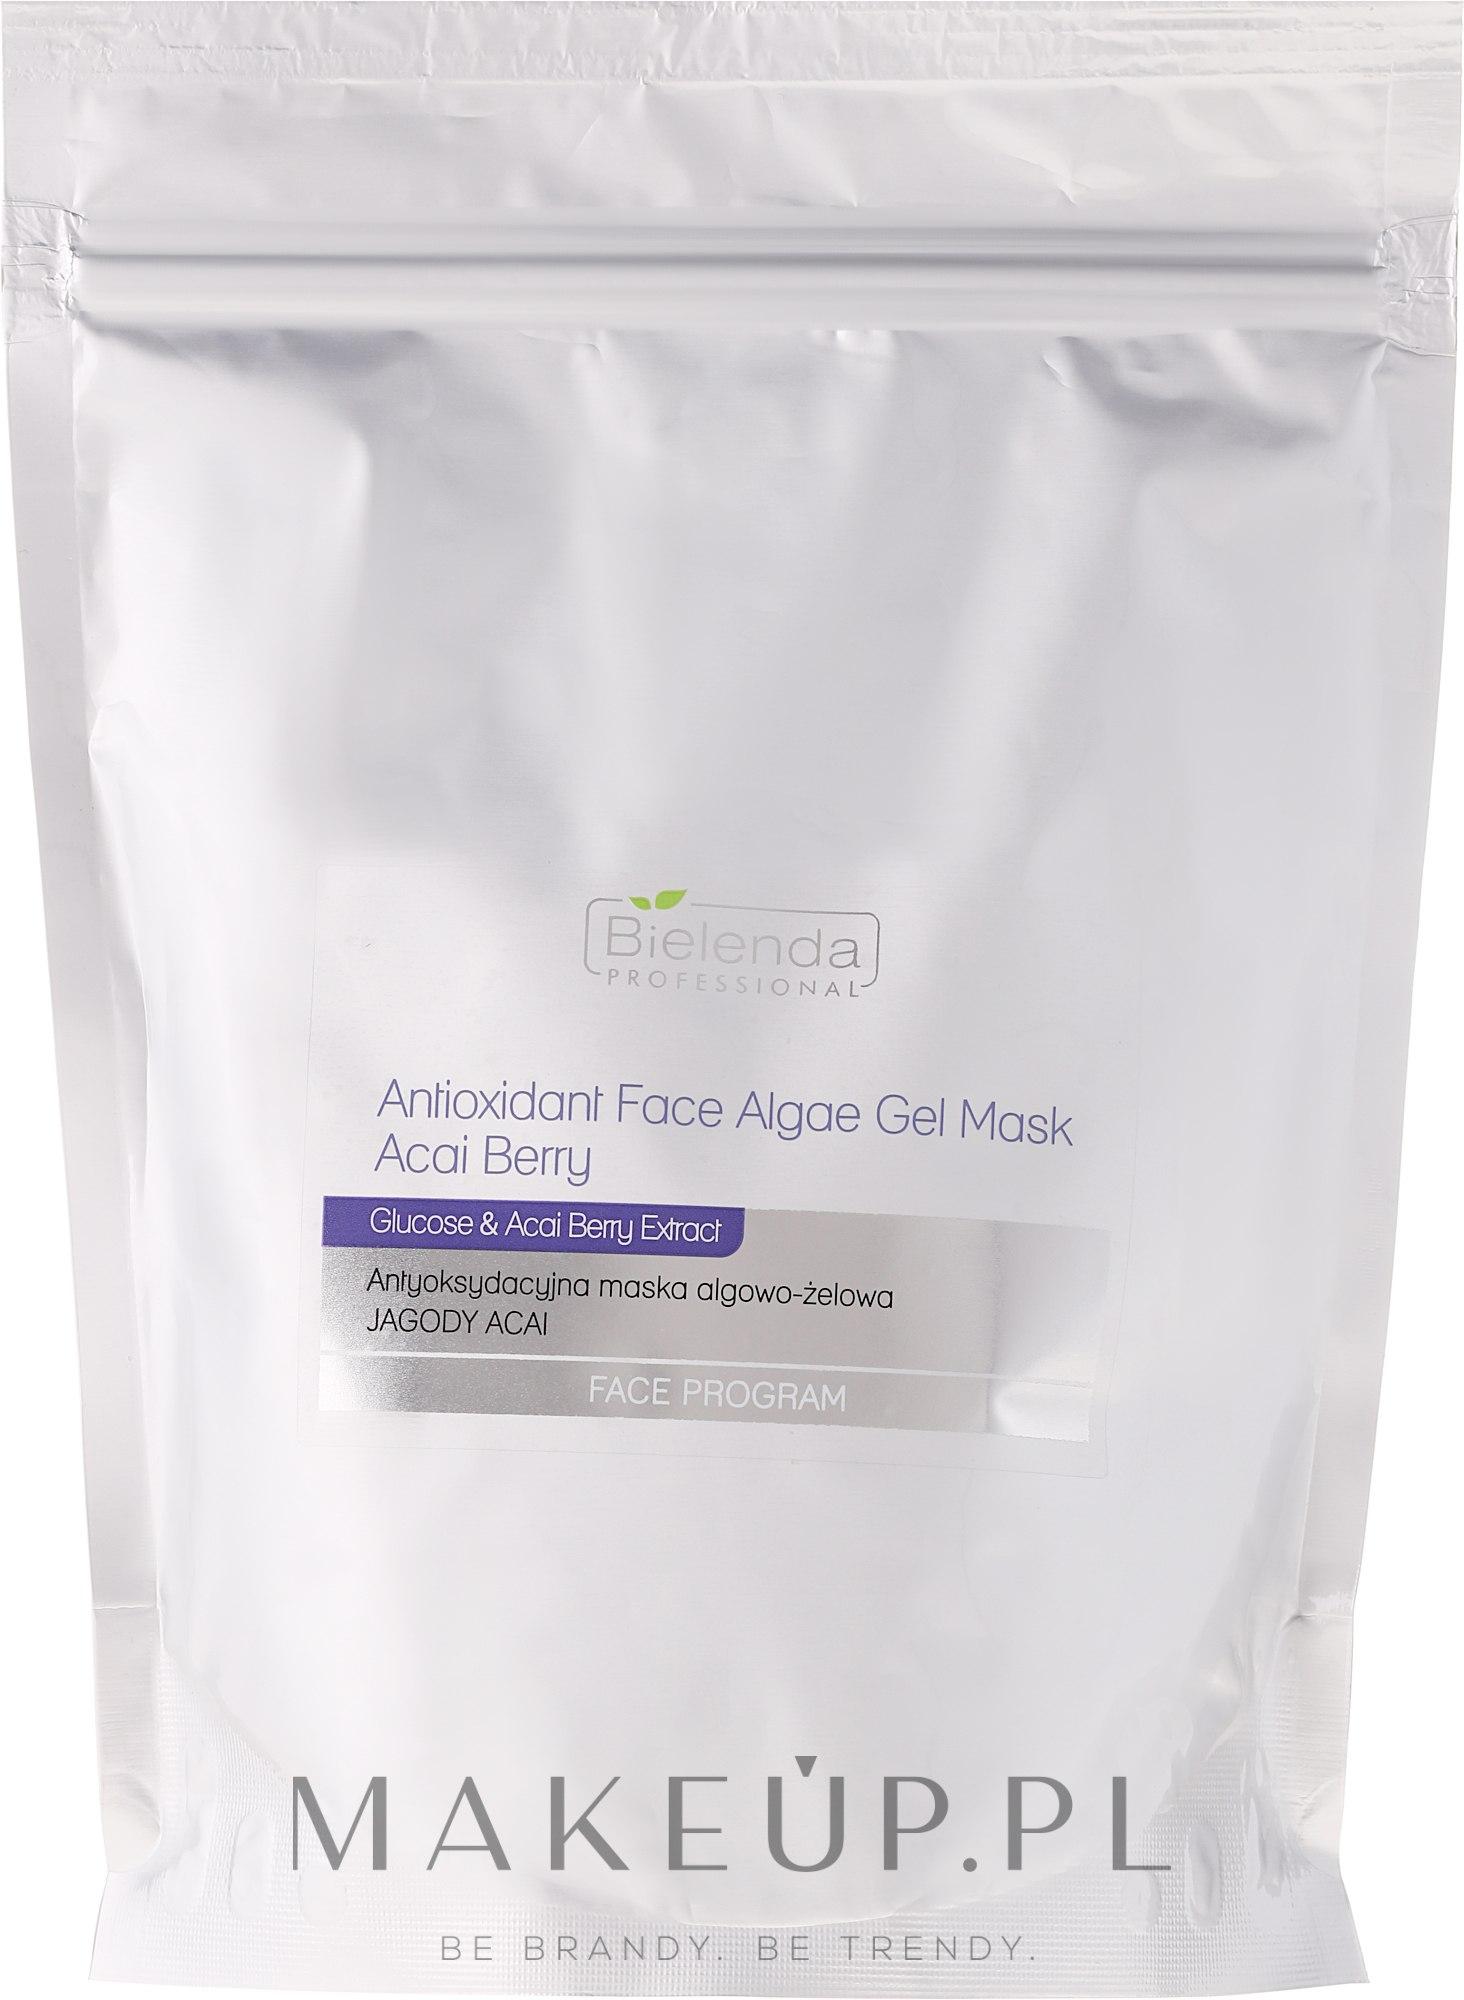 Antyoksydacyjna maska algowo-żelowa Jagody acai - Bielenda Professional Face Program Antioxidant Face Algae Gel Mask Acai Berry (uzupełnienie) — фото 190 g